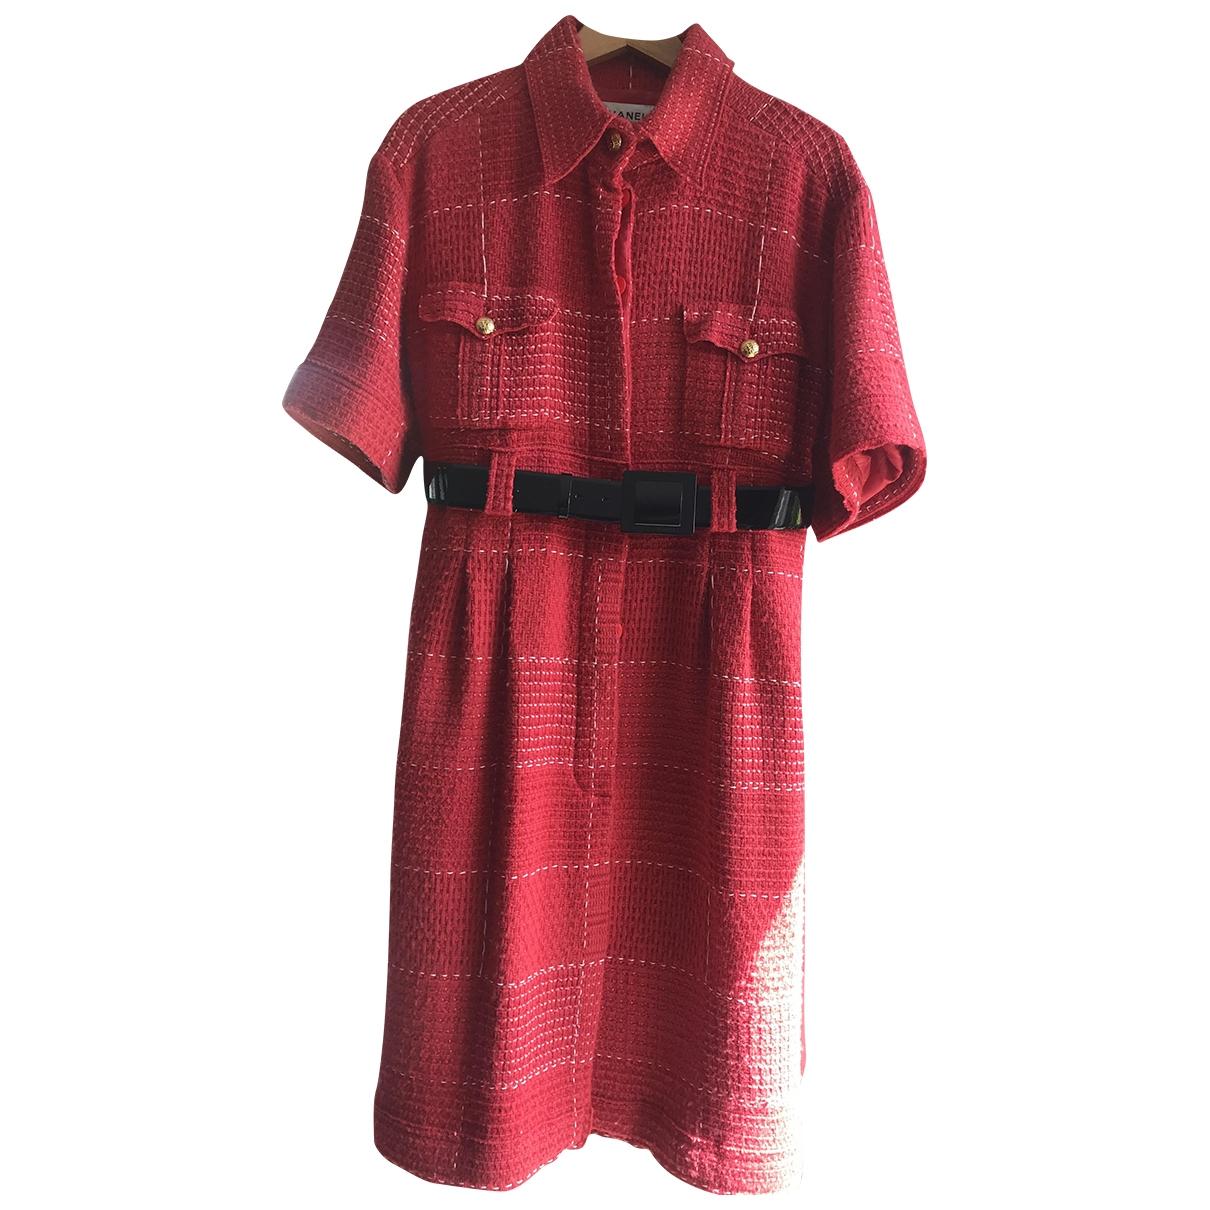 Chanel \N Red Wool dress for Women 46 FR